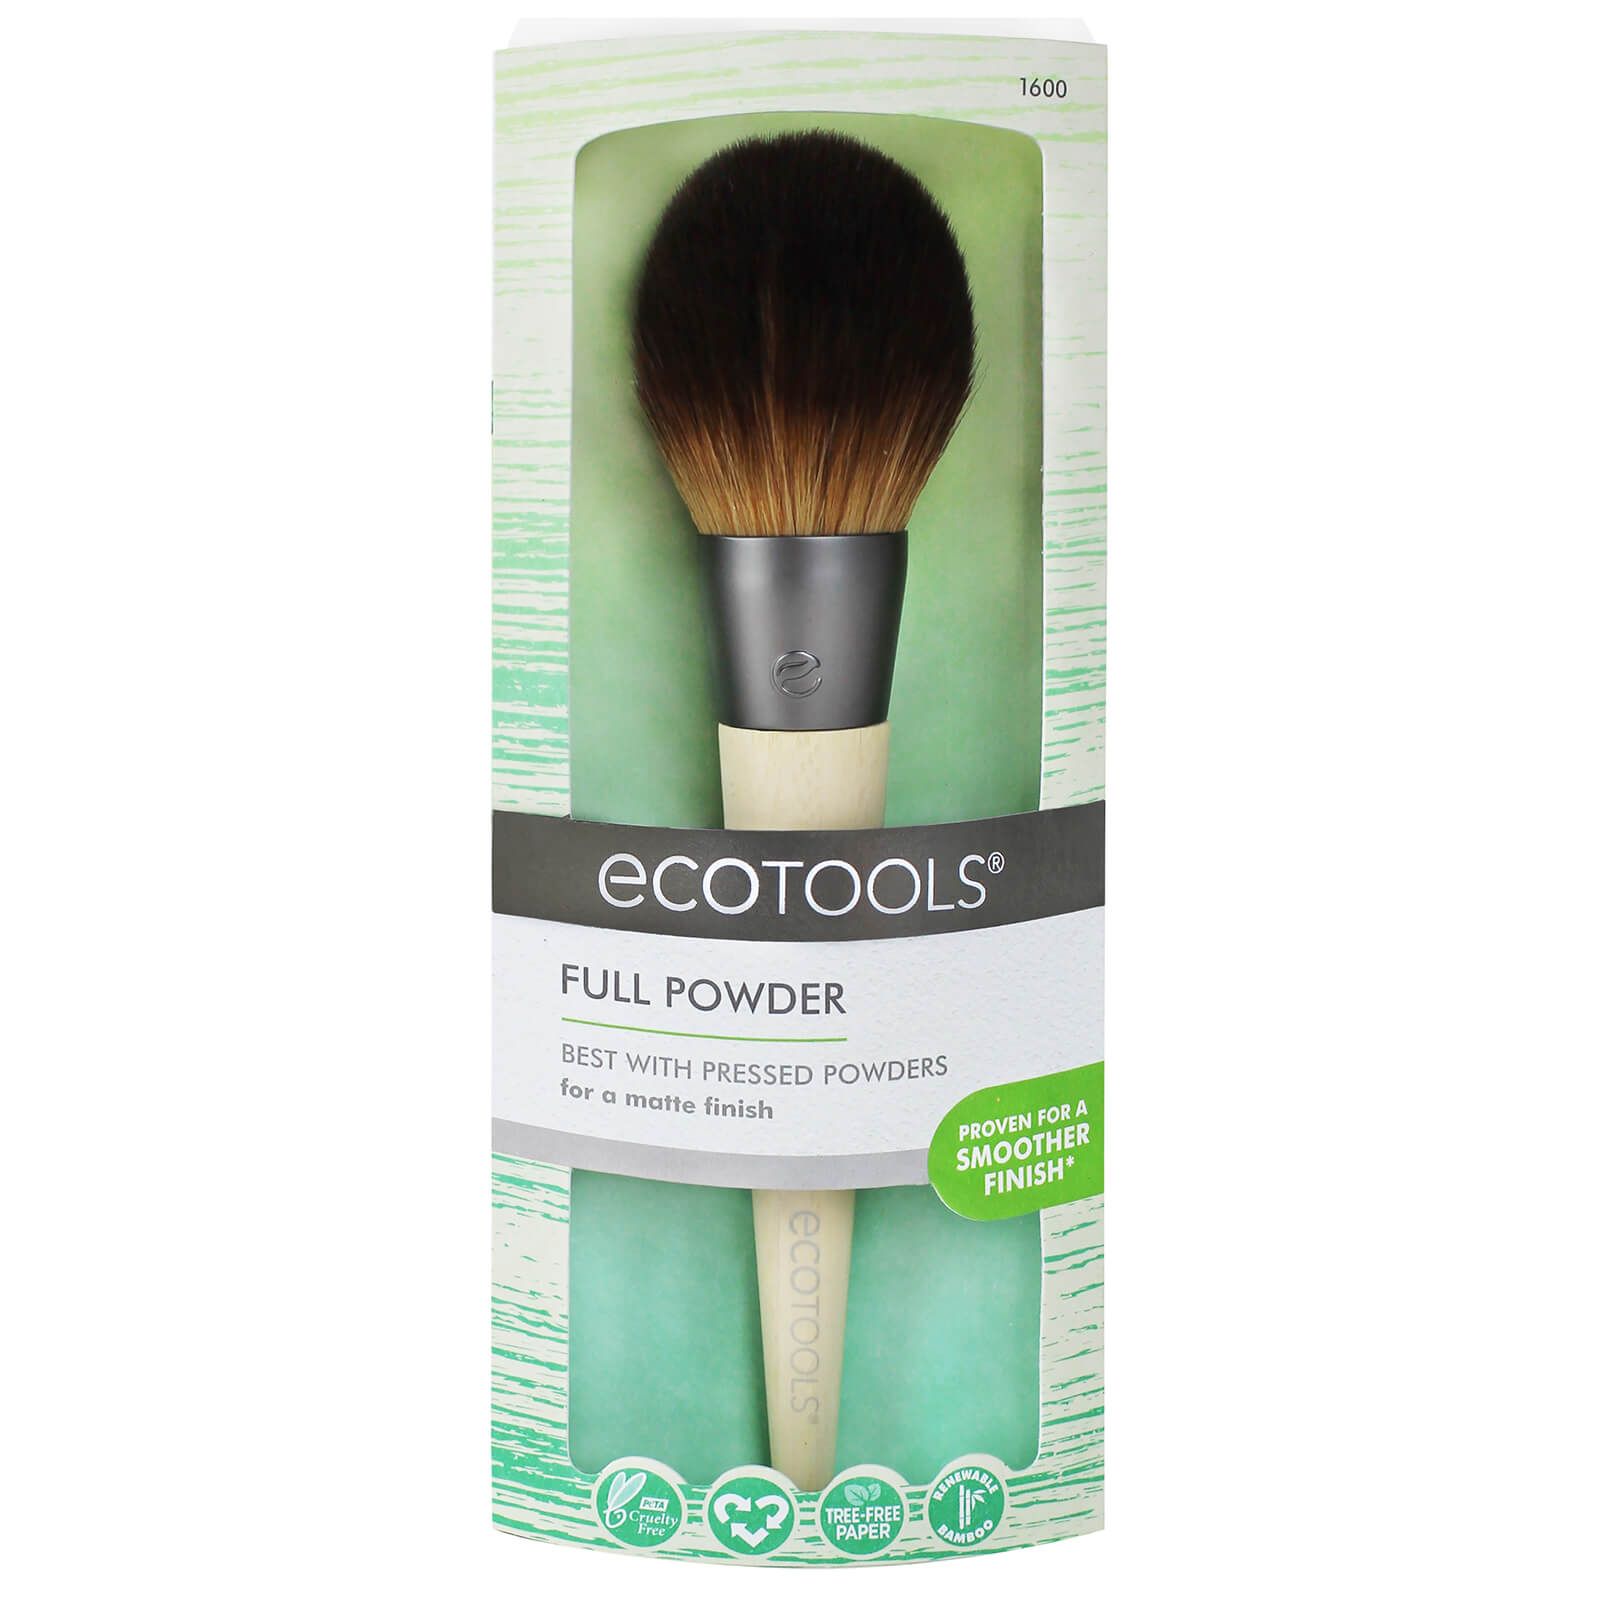 EcoTools Full Powder